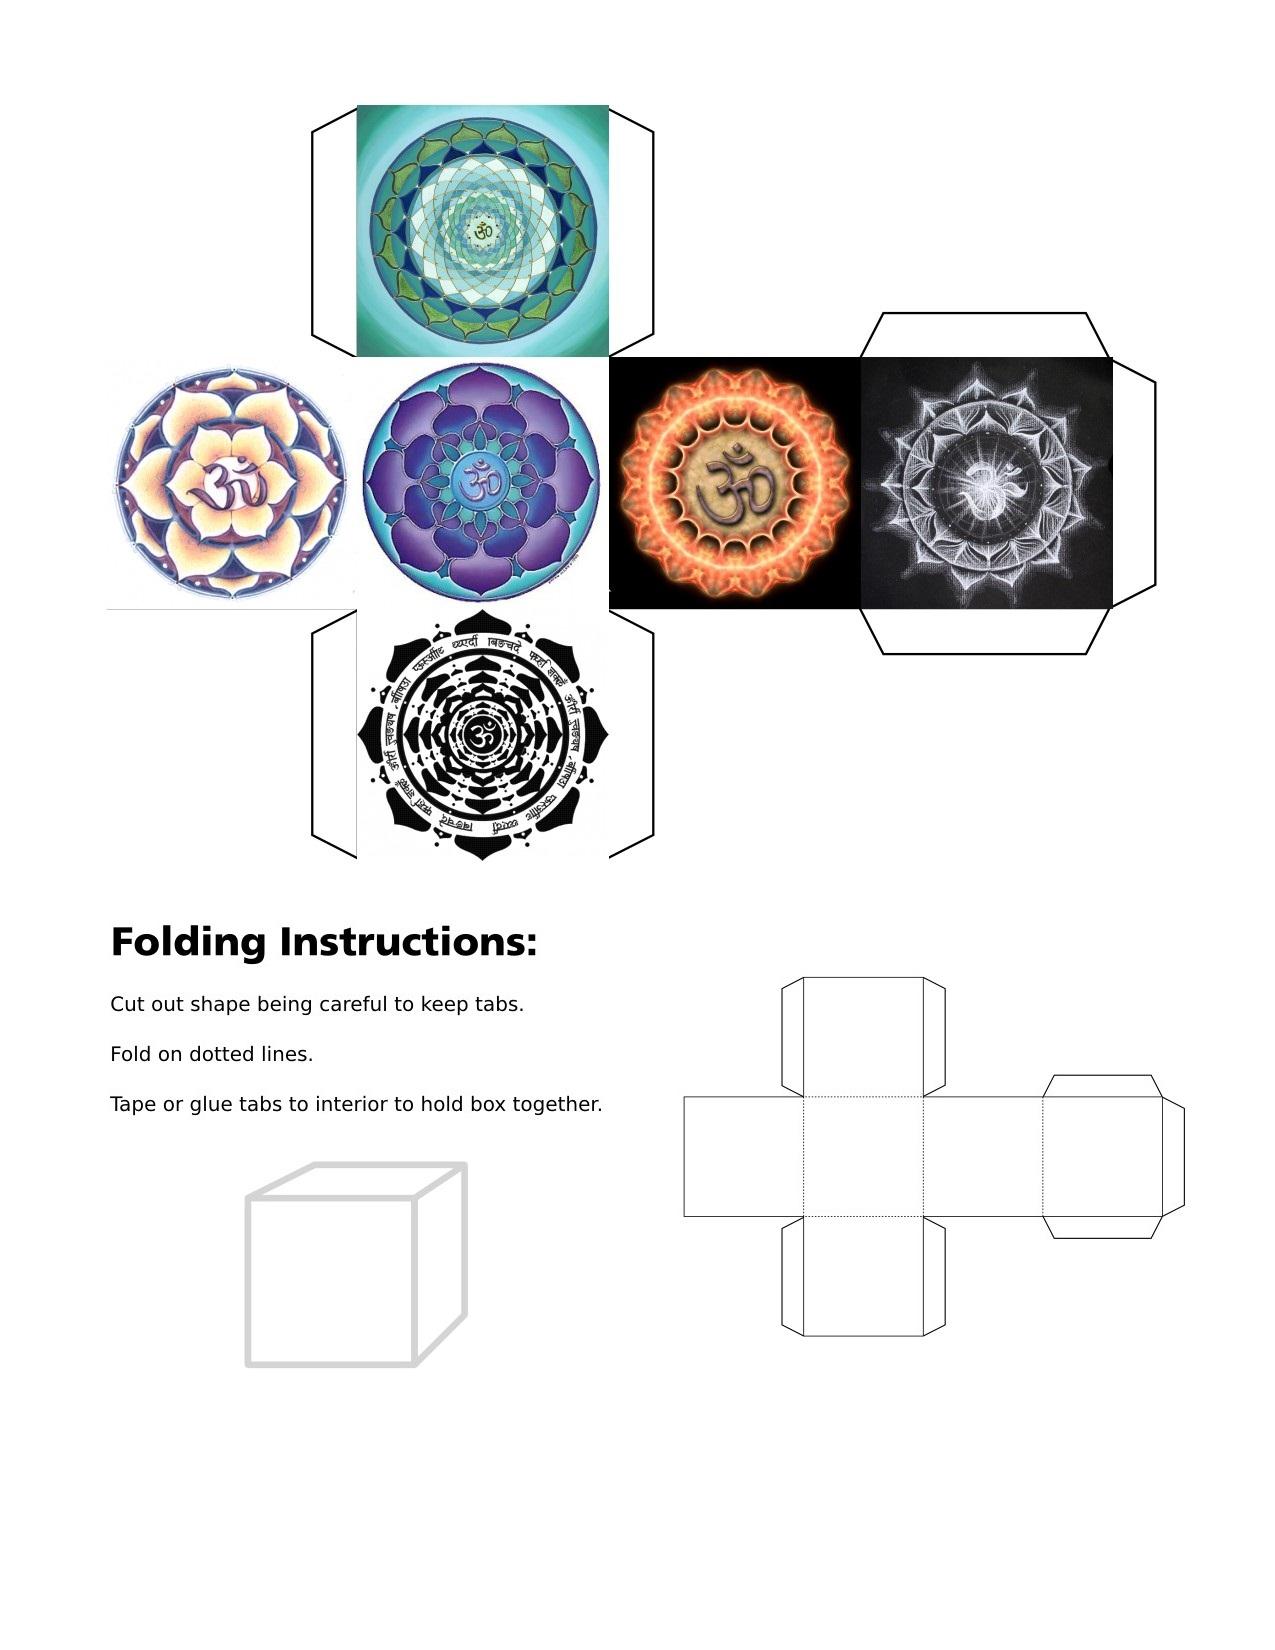 cube, 3d cube, Om symbol, black om, blue om, gold om, green om, orange om, purple om, red om, mandala